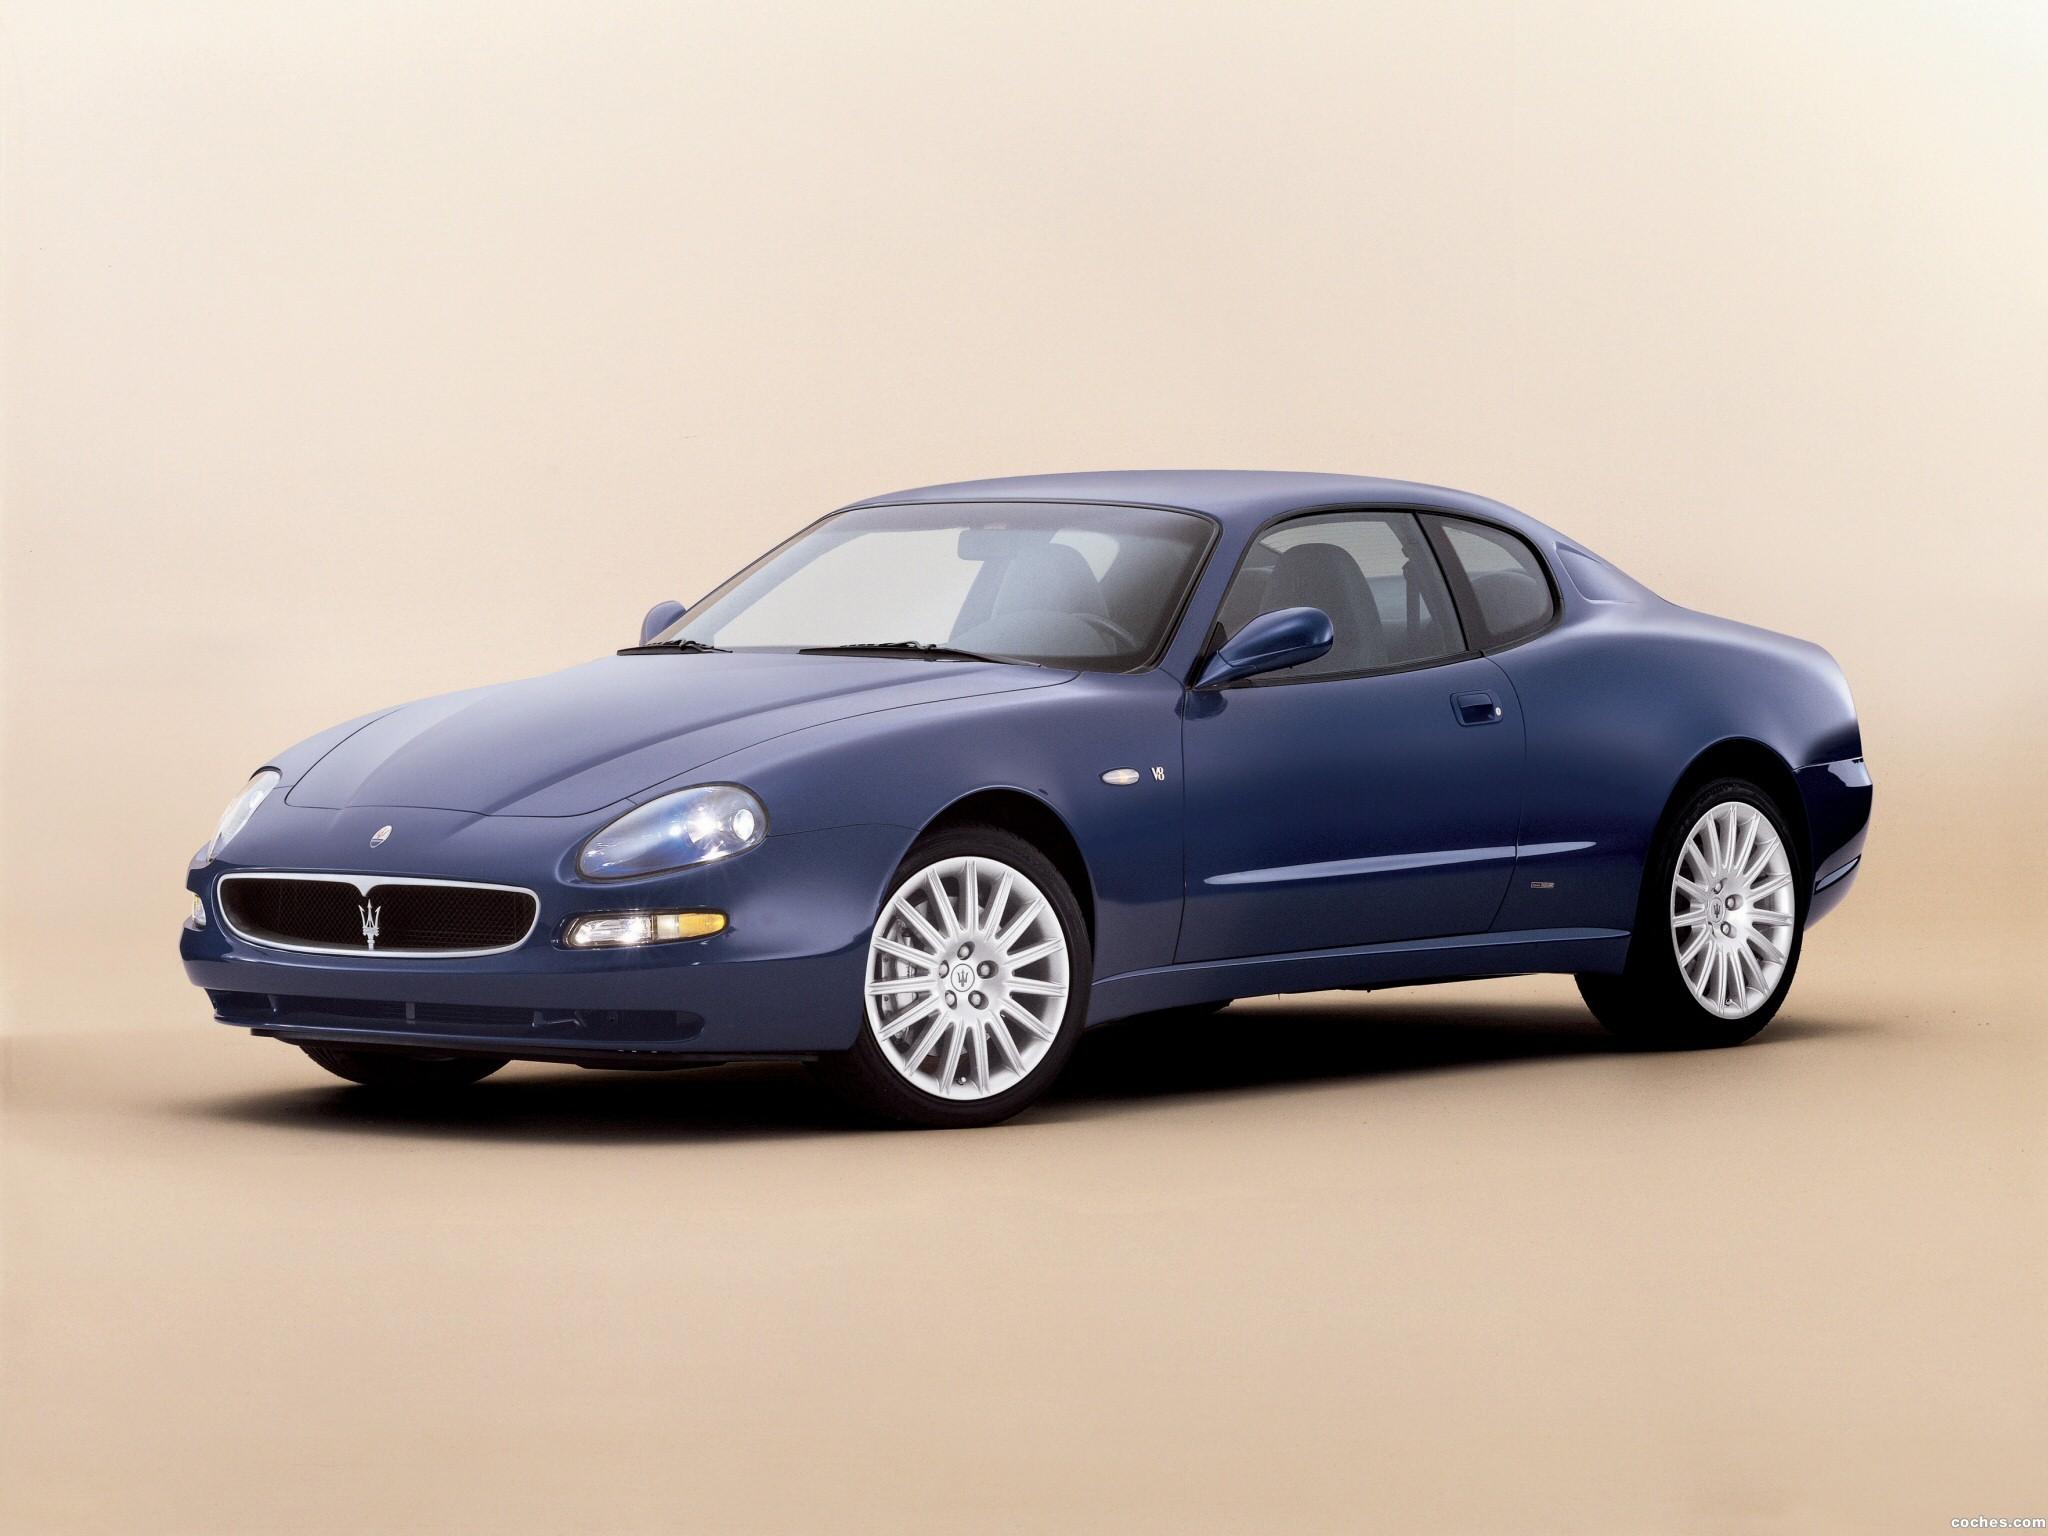 Fotos de Maserati Coupe 2001